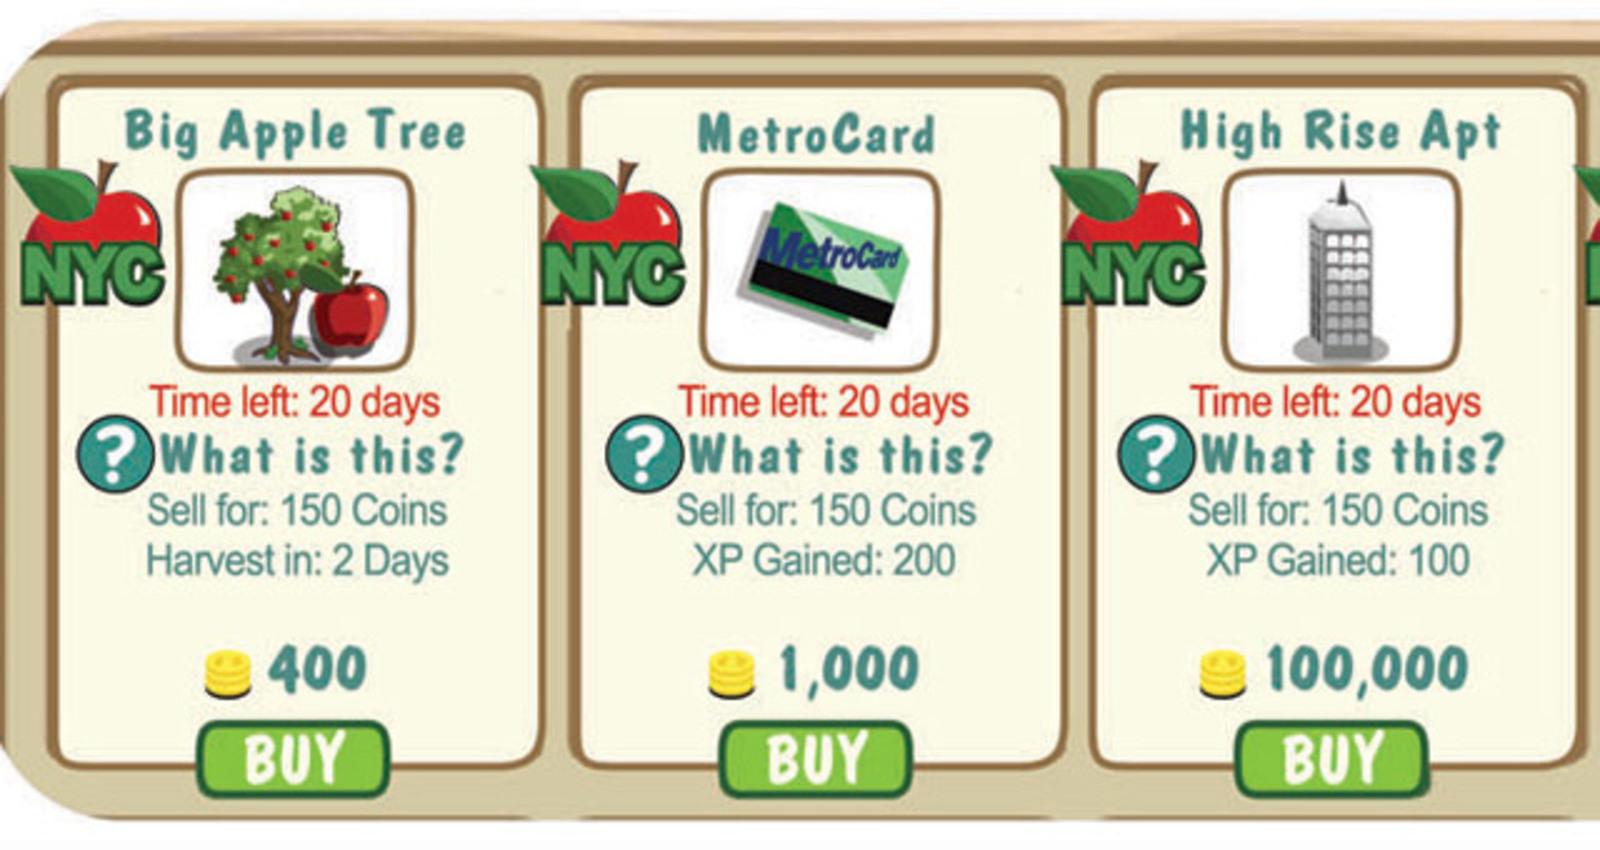 Green MetroCard